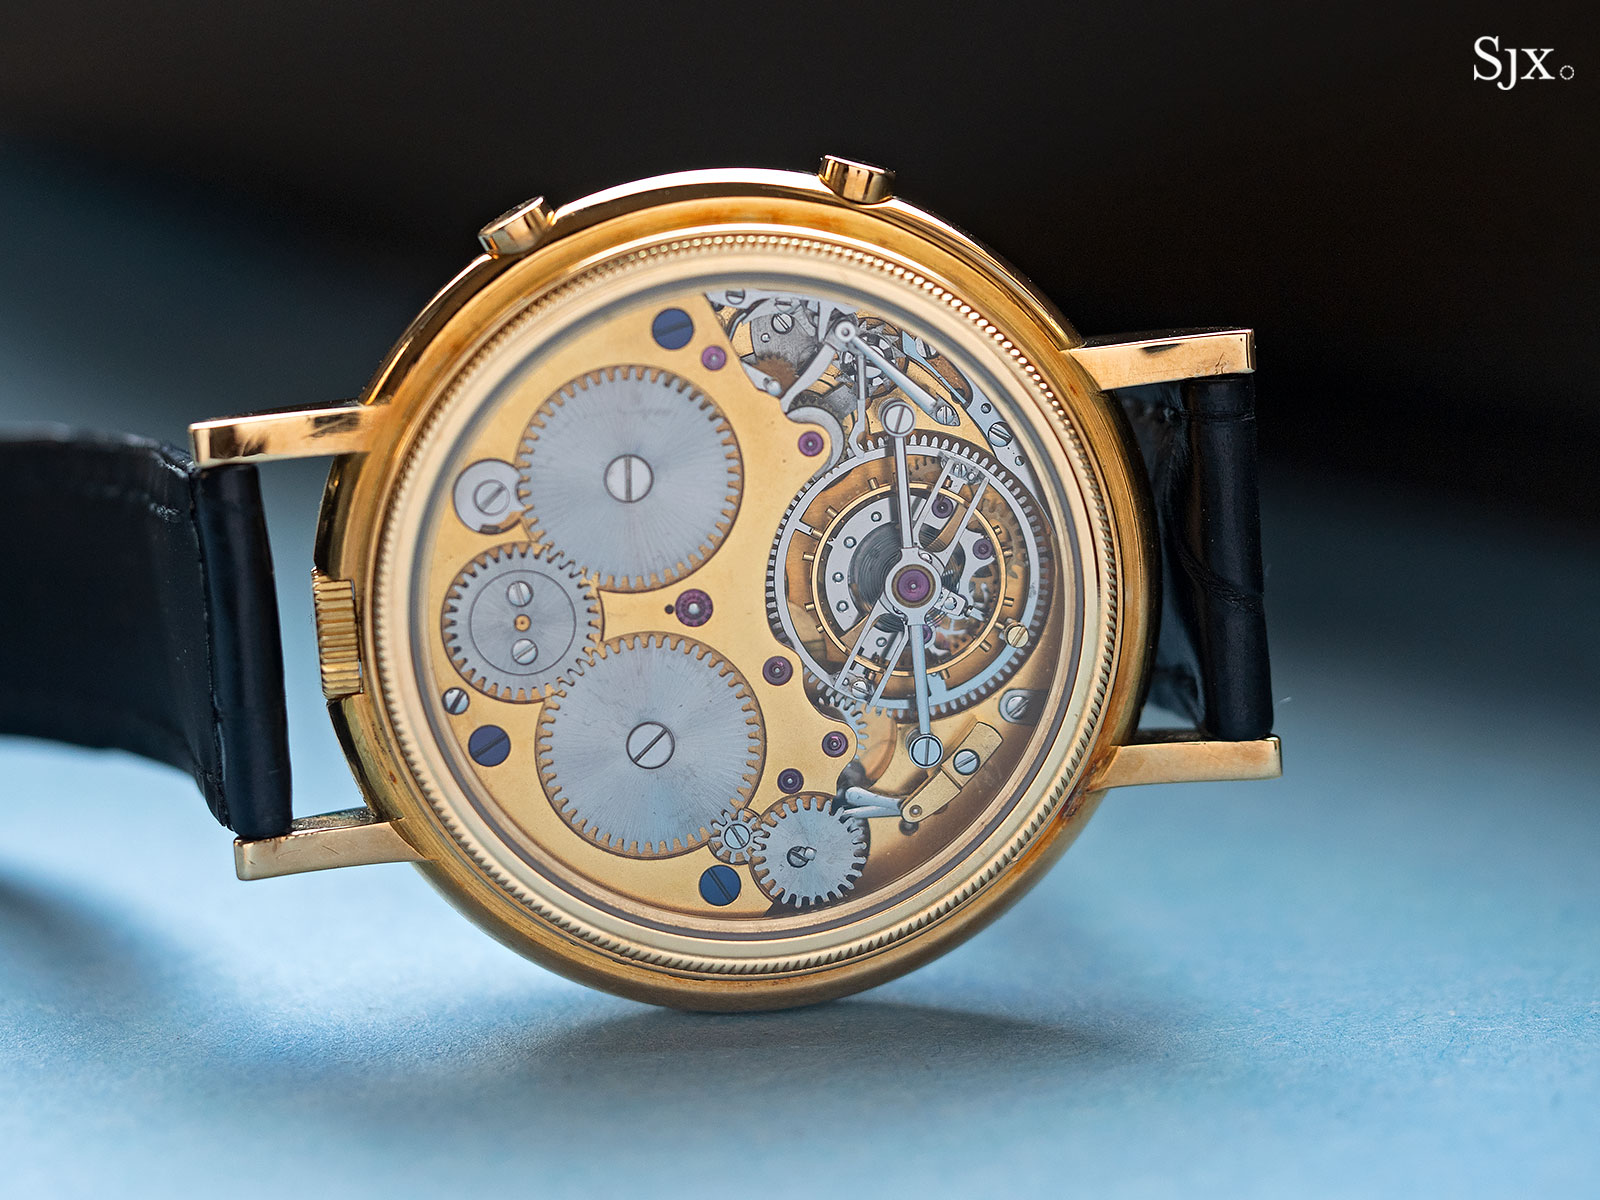 George Daniels Chronograph Wristwatch with tourbillon 13